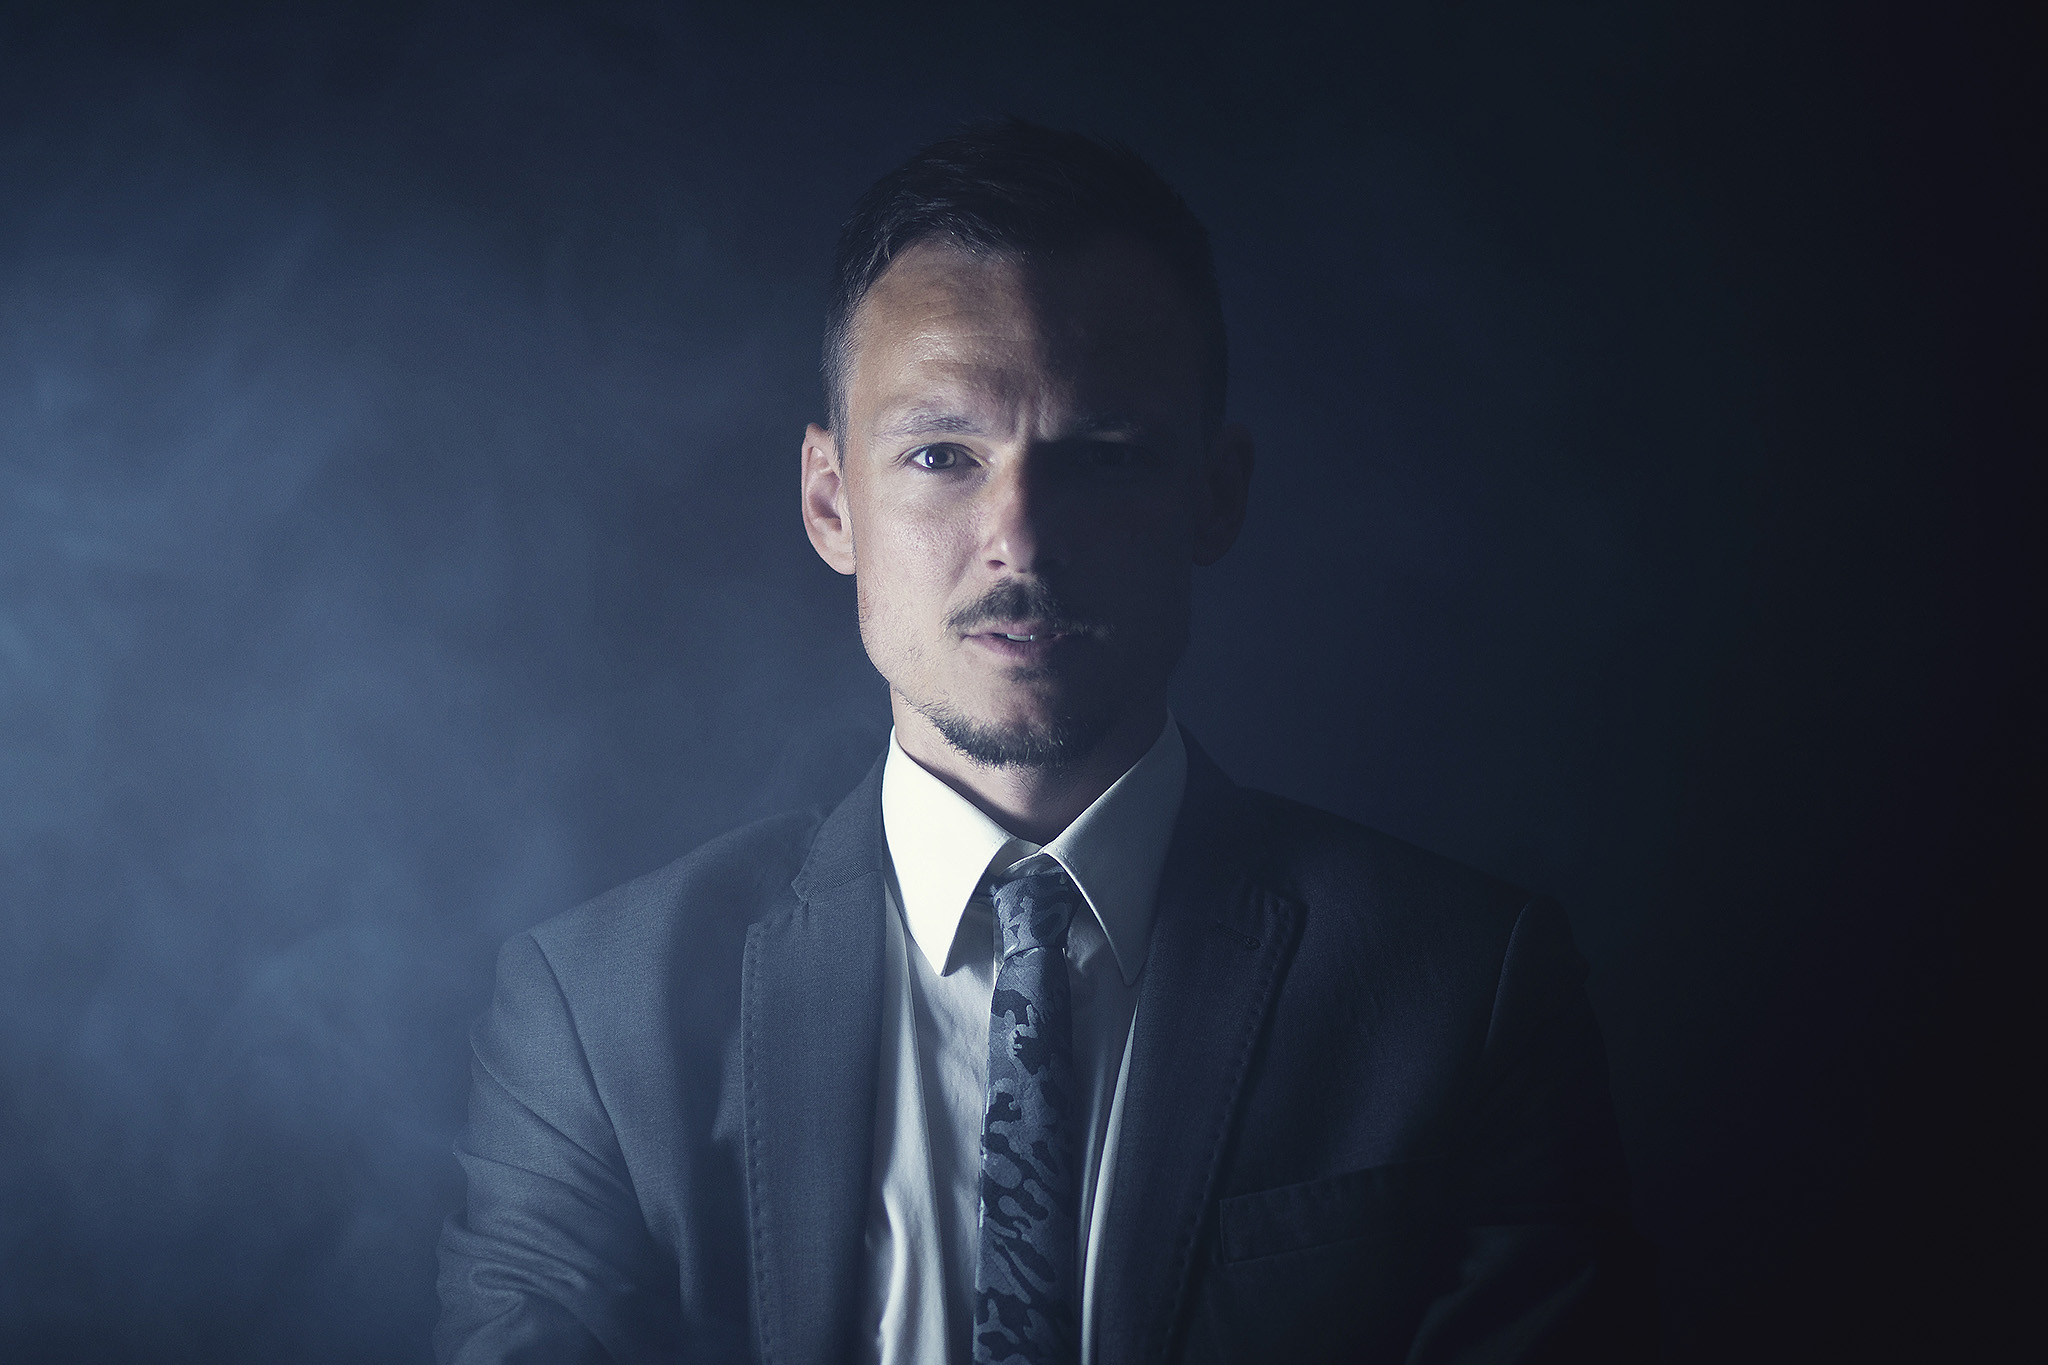 Business Portrait Nebel Anzug seriös Krawatte Belichtung Studiofotografie Fotografie